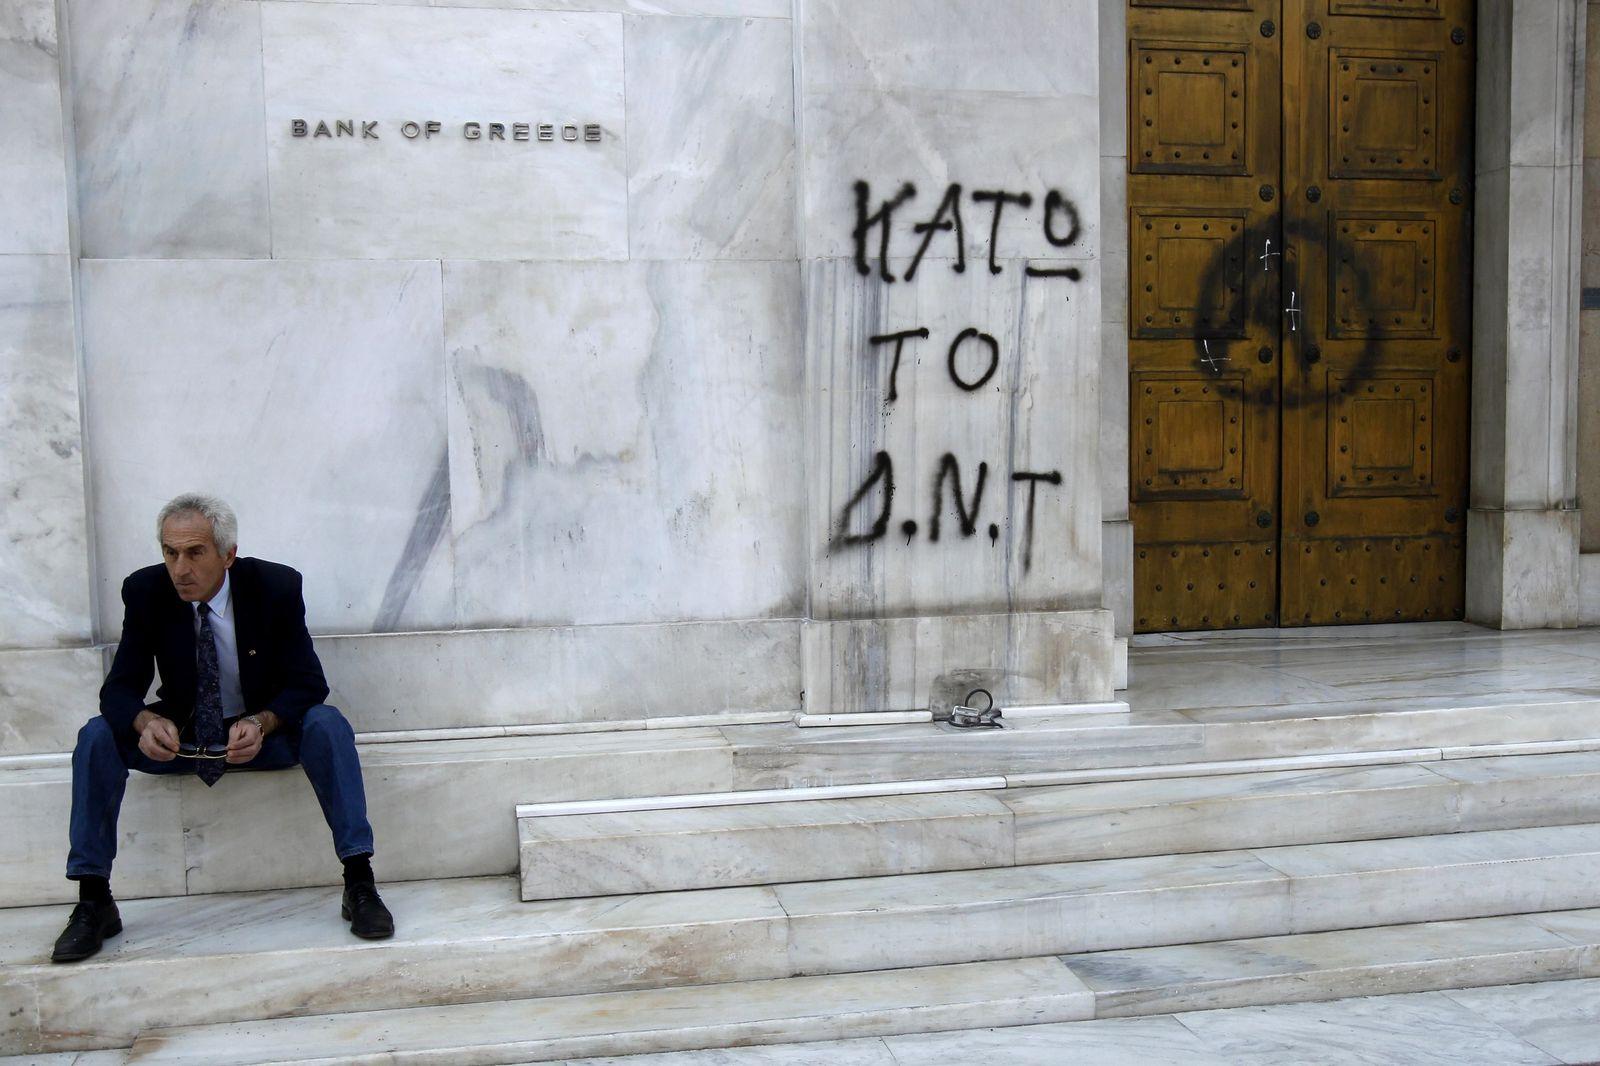 Greece national bank